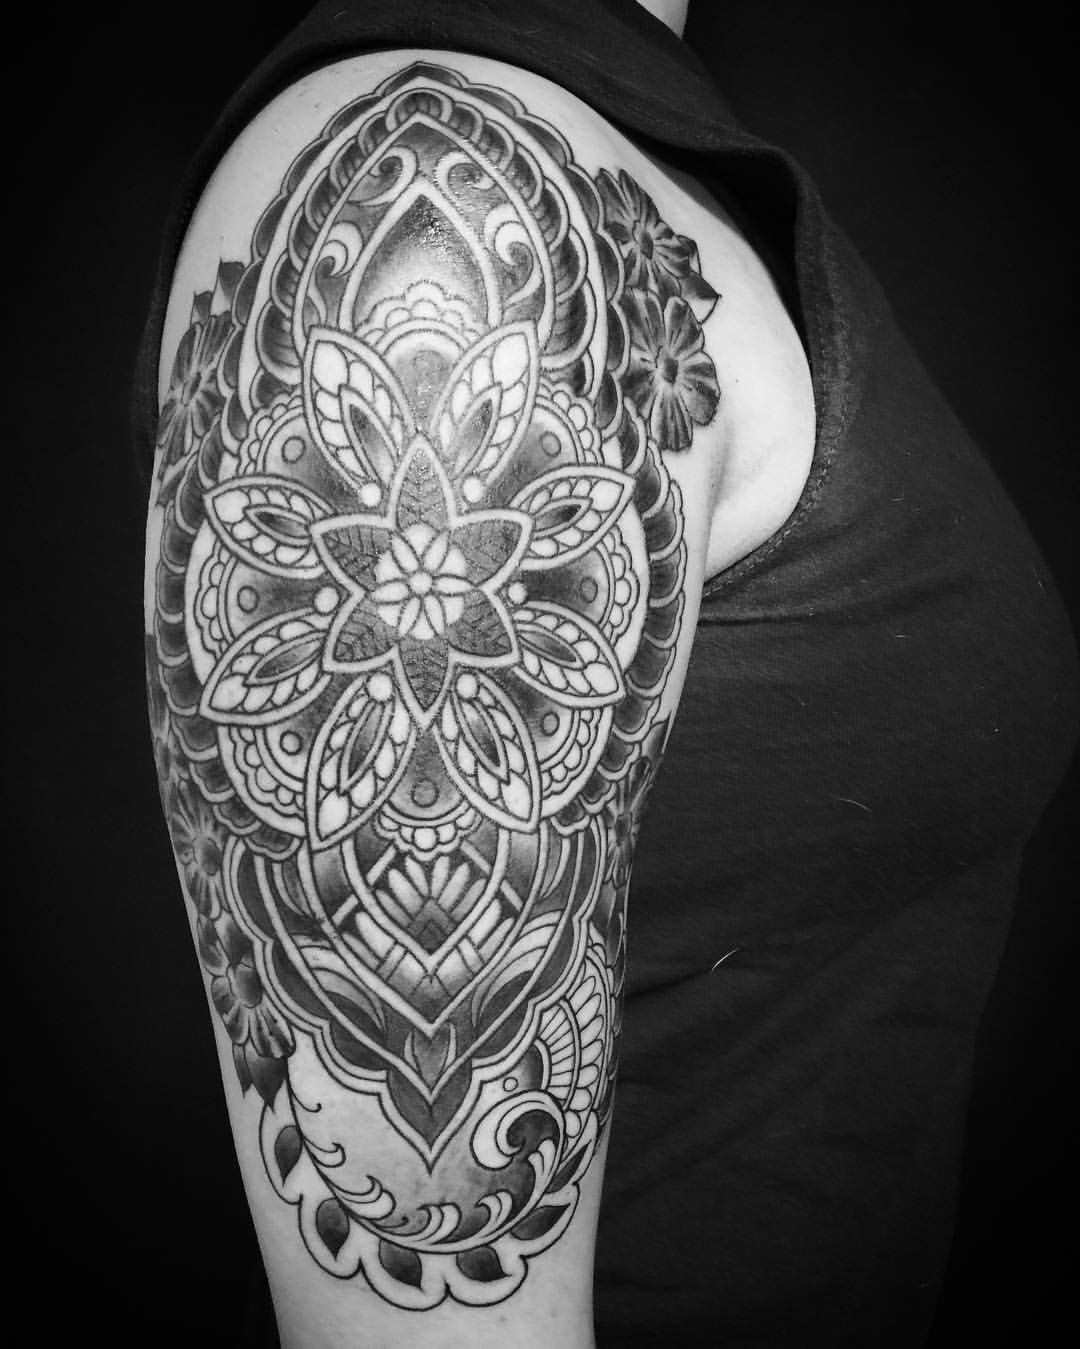 c620143aa Mandala tattoo half sleeve by Oksana weber | Tattoo ideas | Tattoos ...